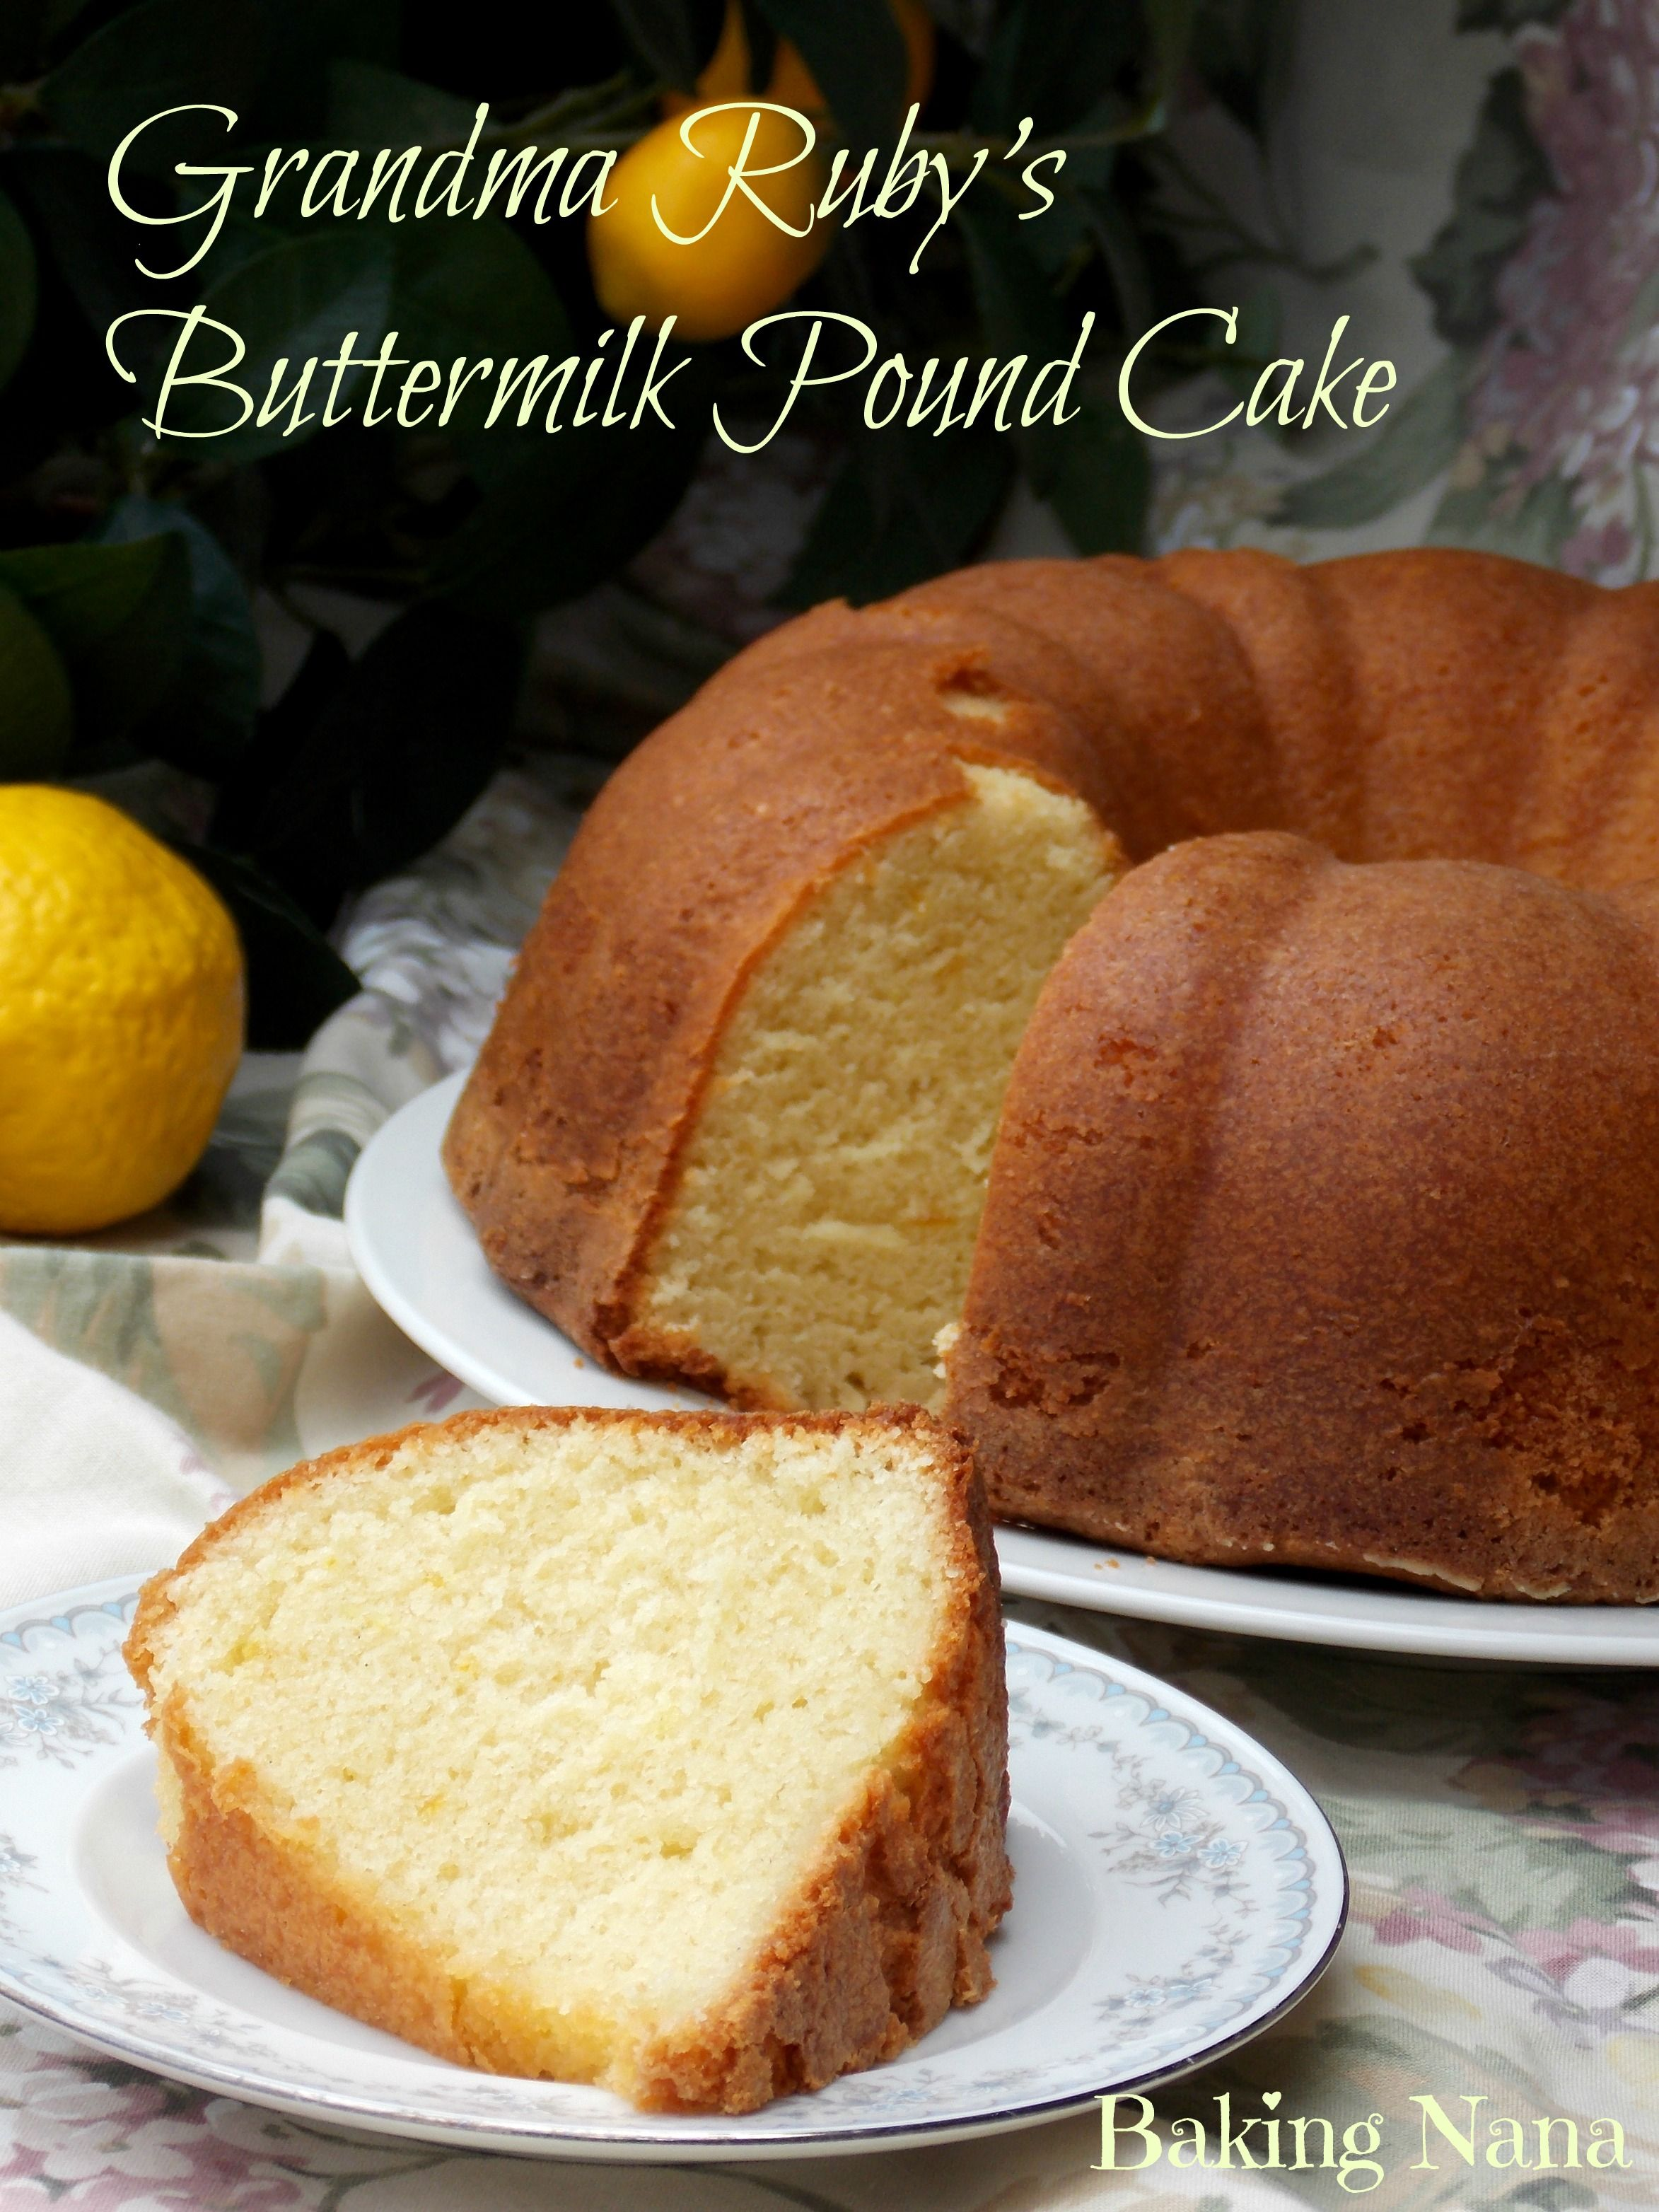 Grandma Ruby S Buttermilk Pound Cake Recipe Buttermilk Recipes Pound Cake Recipes Cake Recipes